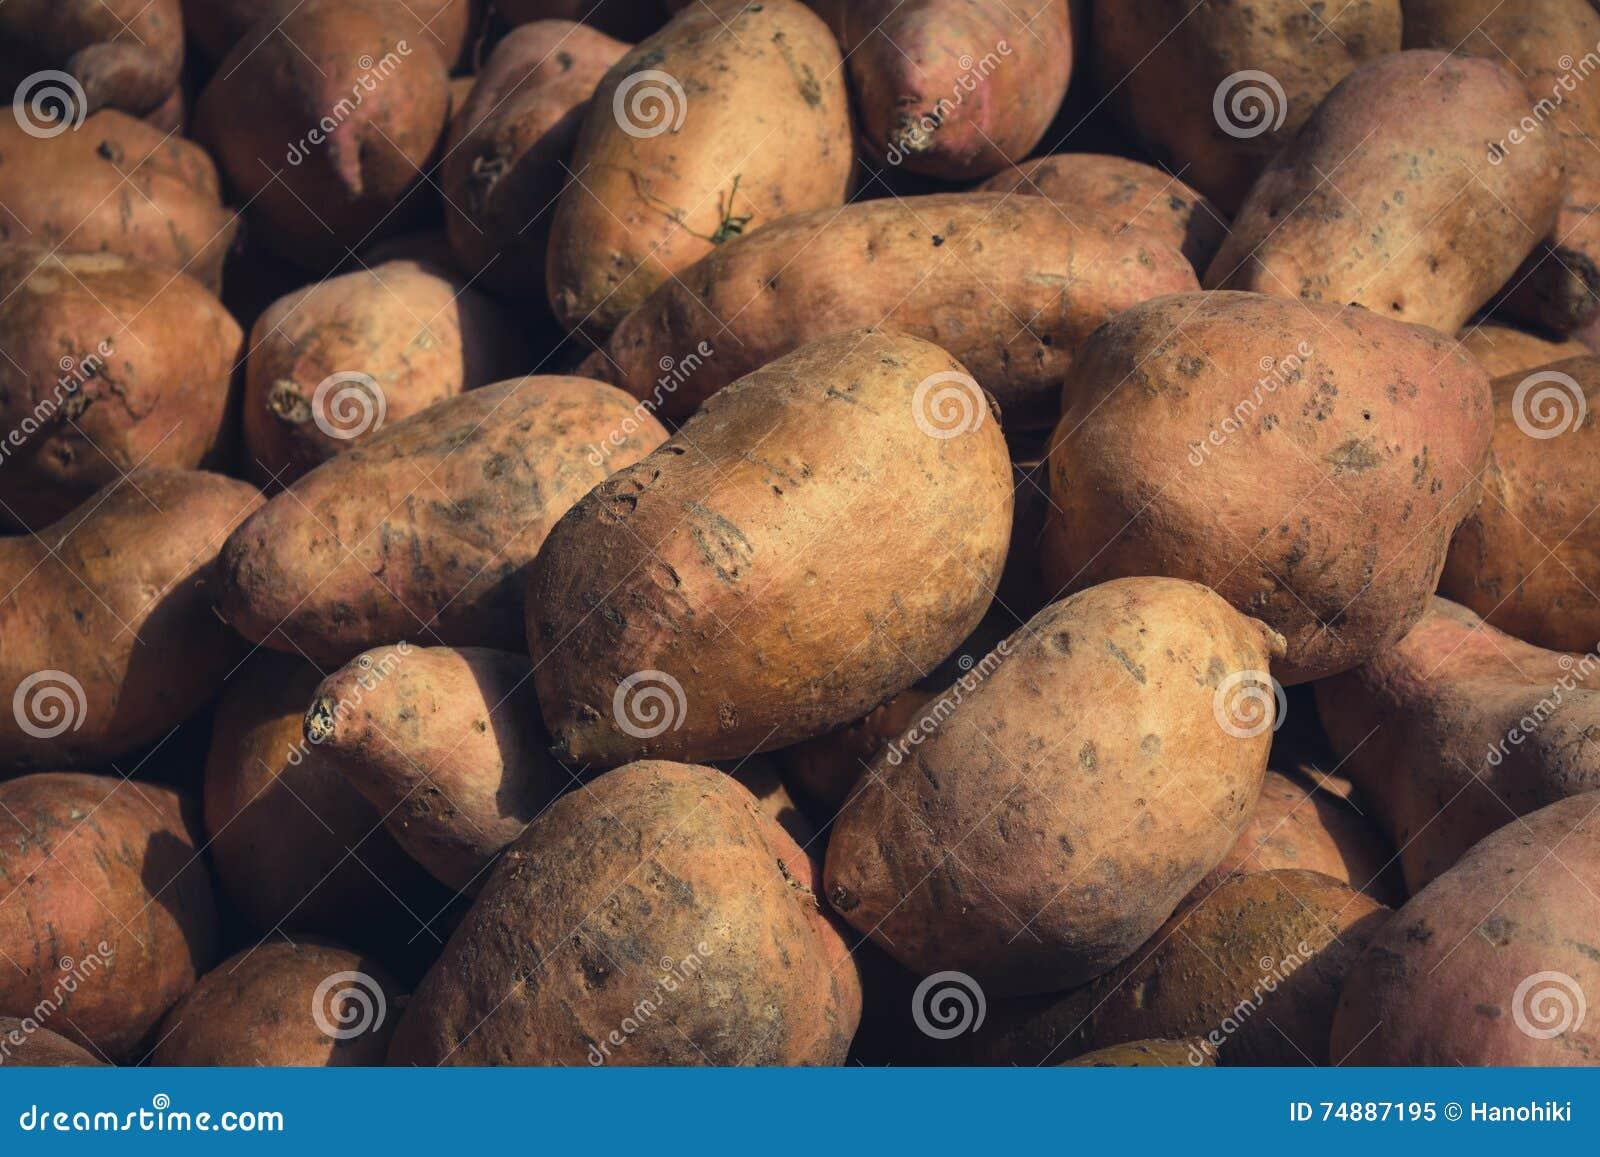 Batata doce - fundo cru das batatas doces -